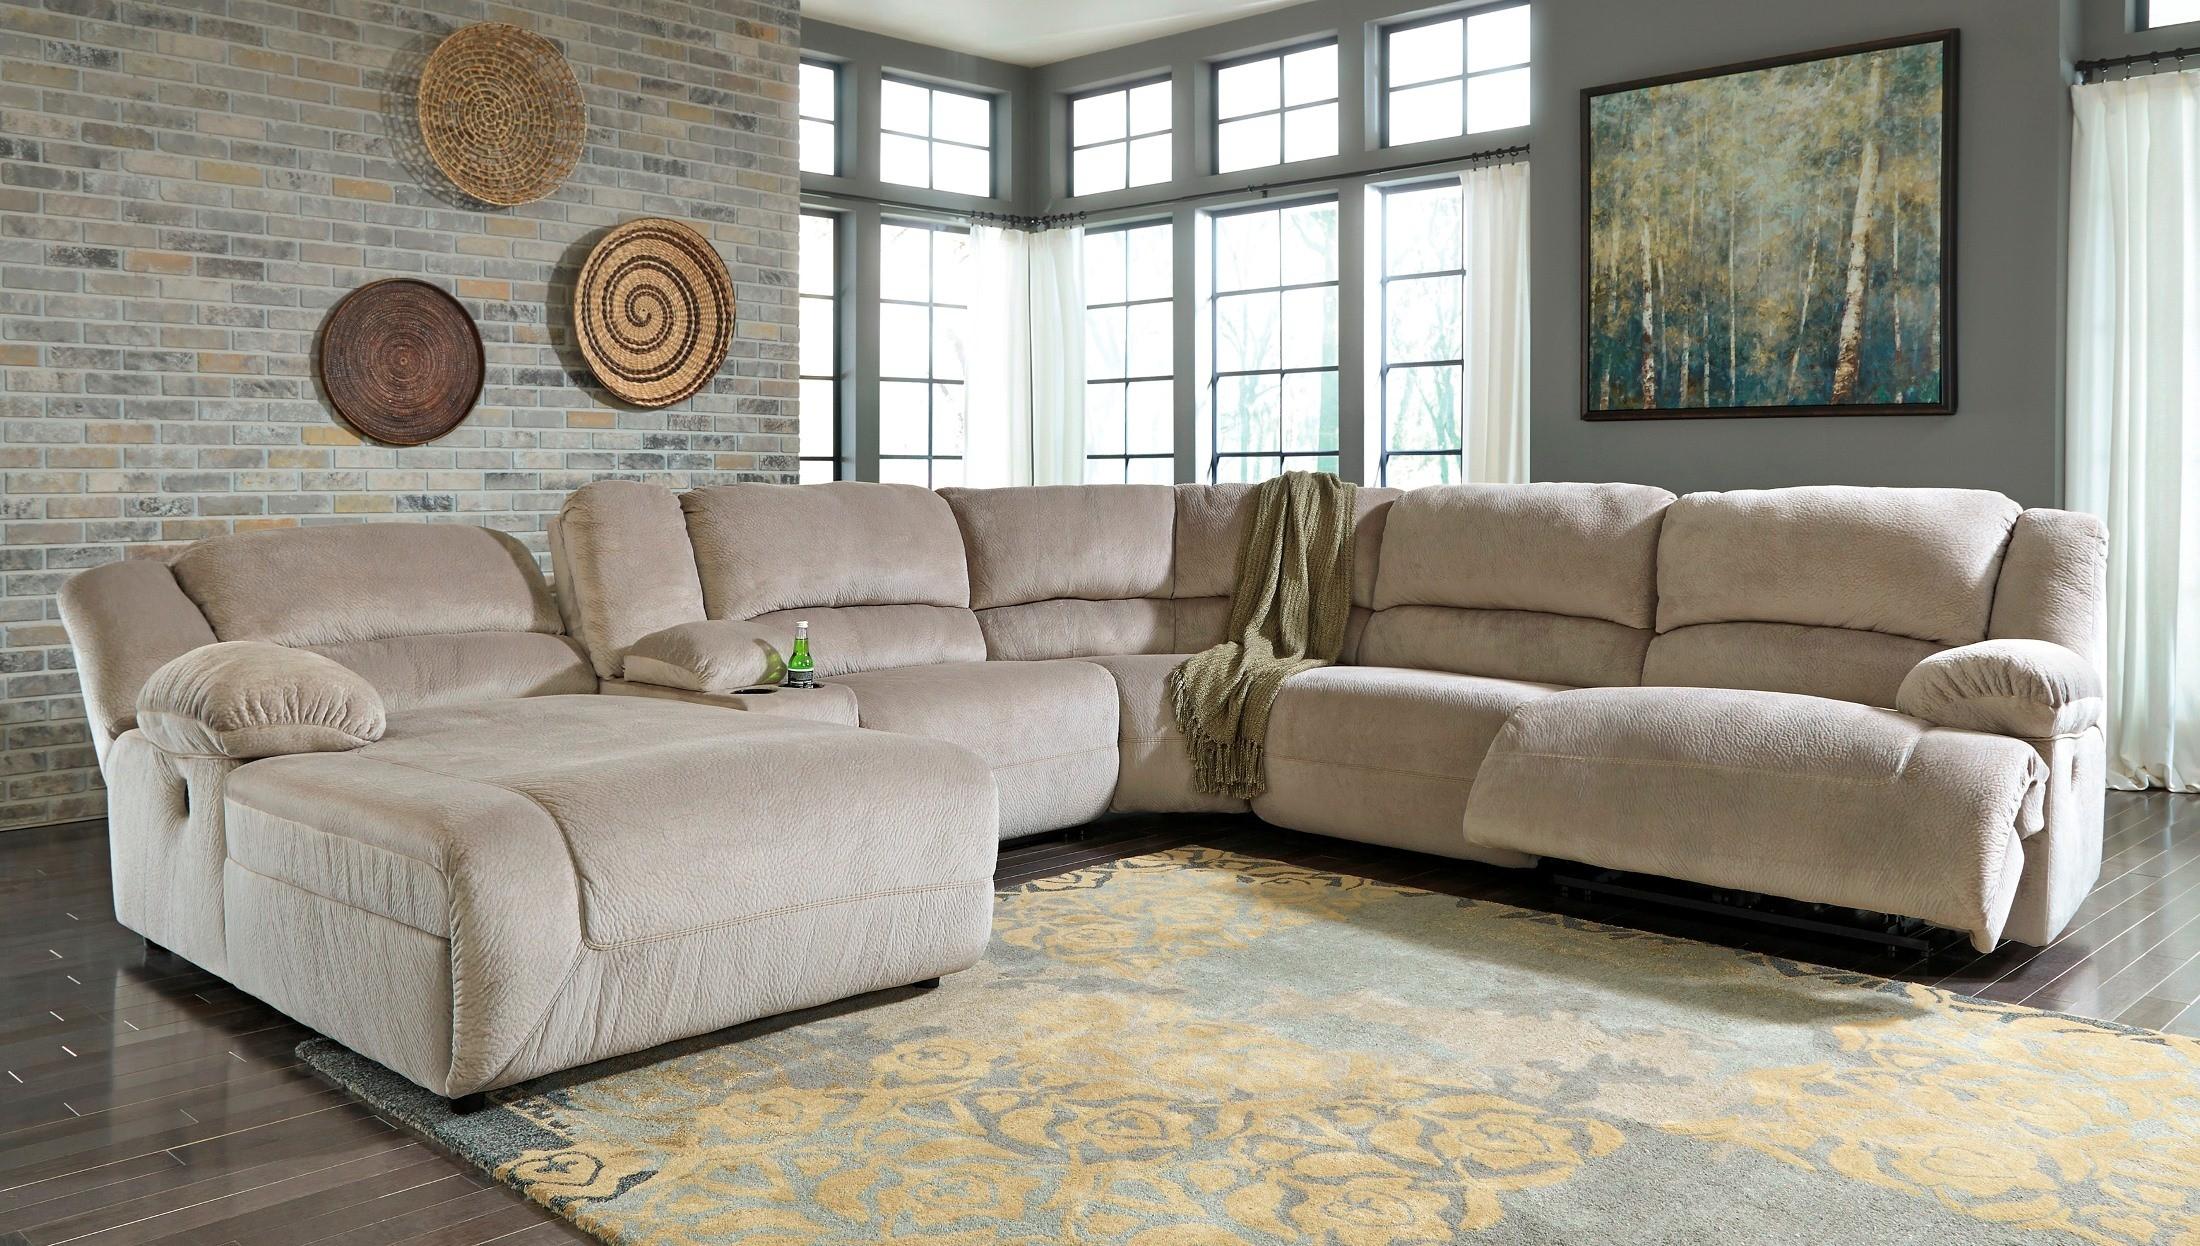 Toletta Granite Raf Sectional From Ashley 5670341